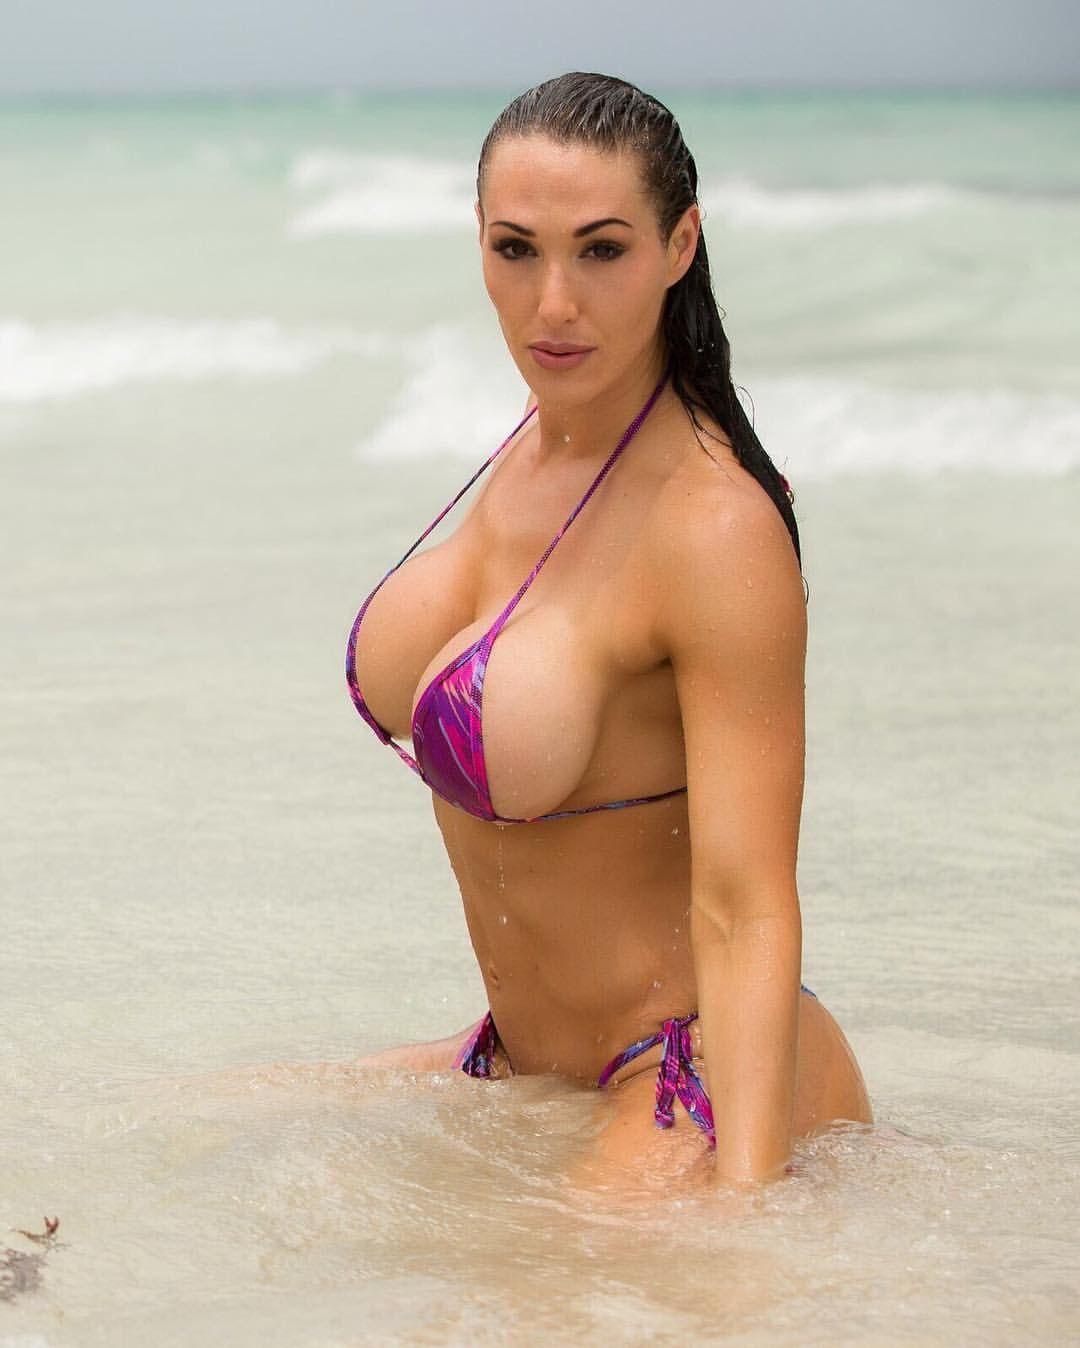 e3cc9afa4f Gia Marie Macool Beach Bunny, Stunning Women, Bahama Mama, Sexy Bikini,  Bikini